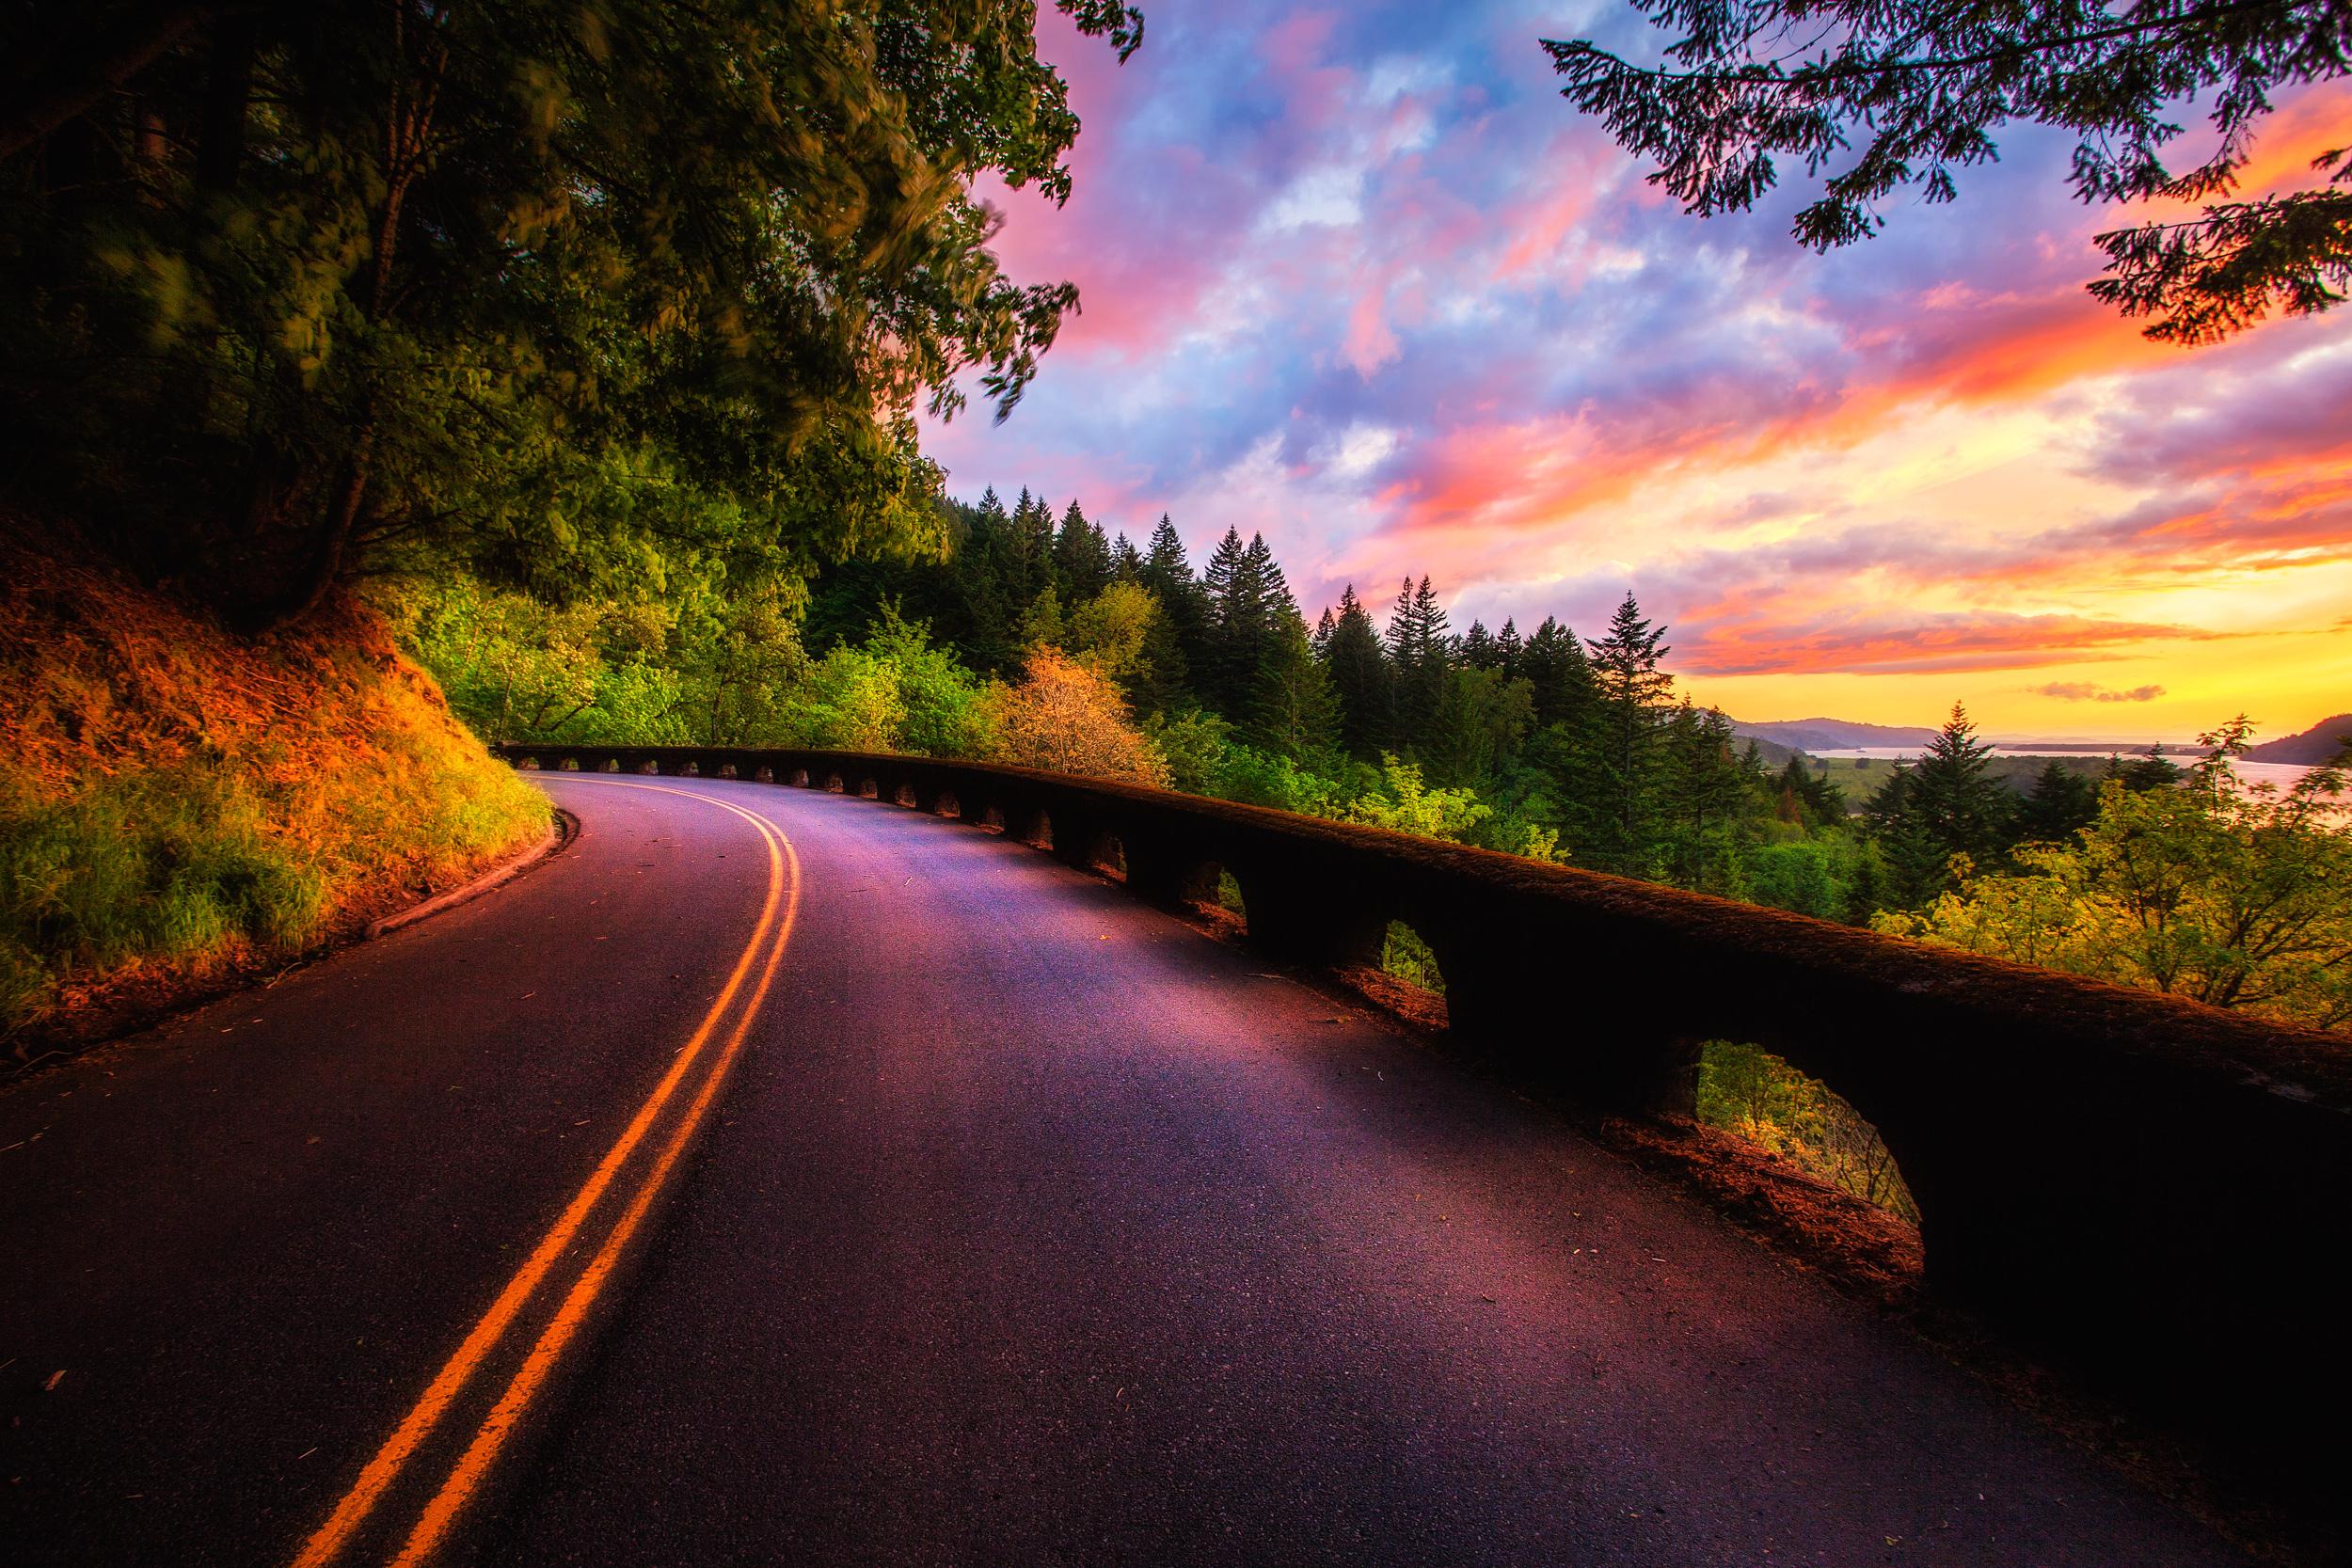 закат, девушка, лесная дорога без смс